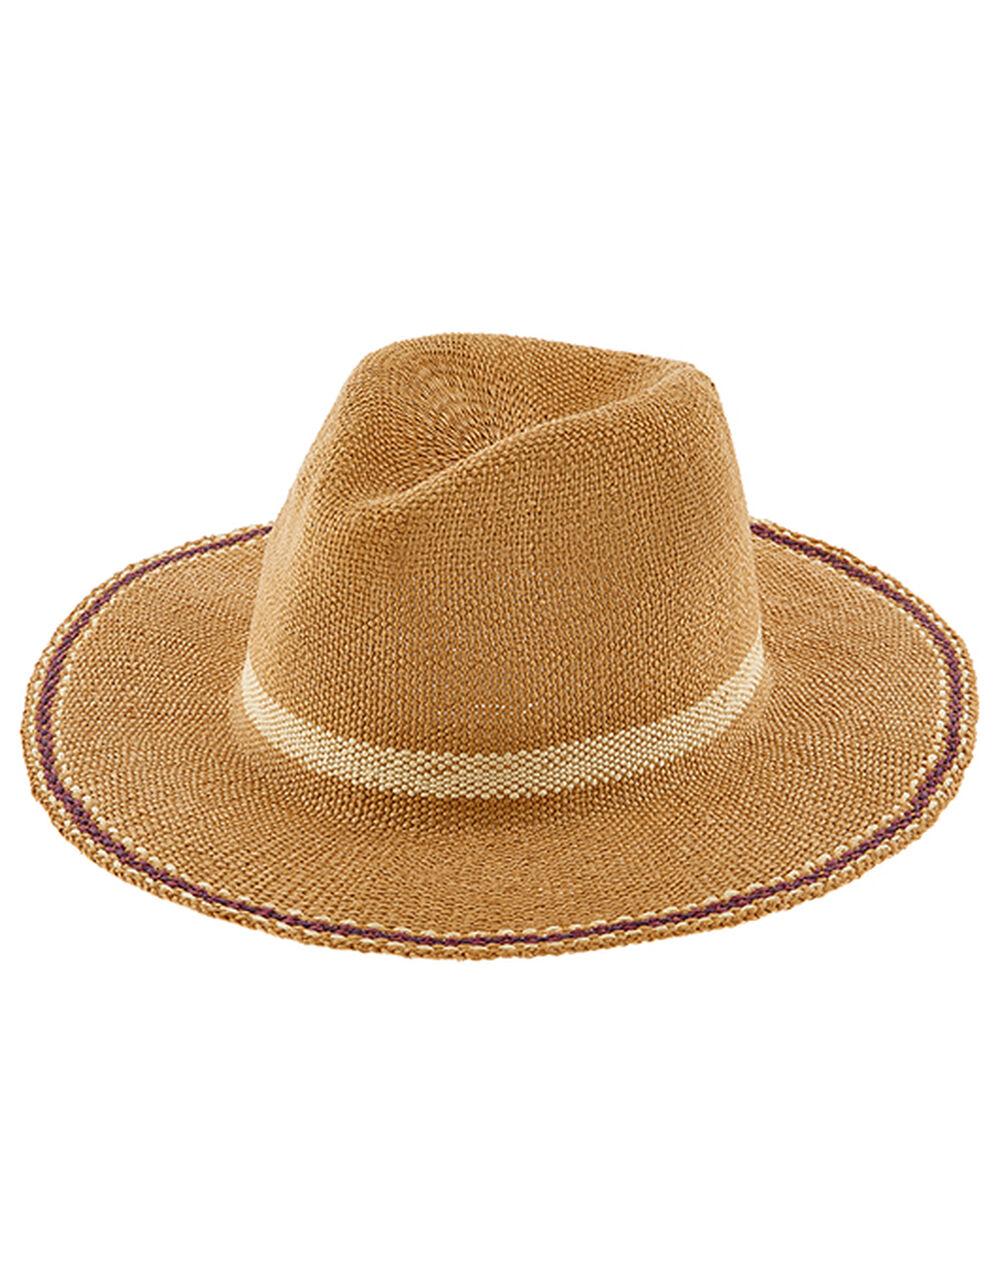 Casablanca Fedora Hat, Natural (NATURAL), large